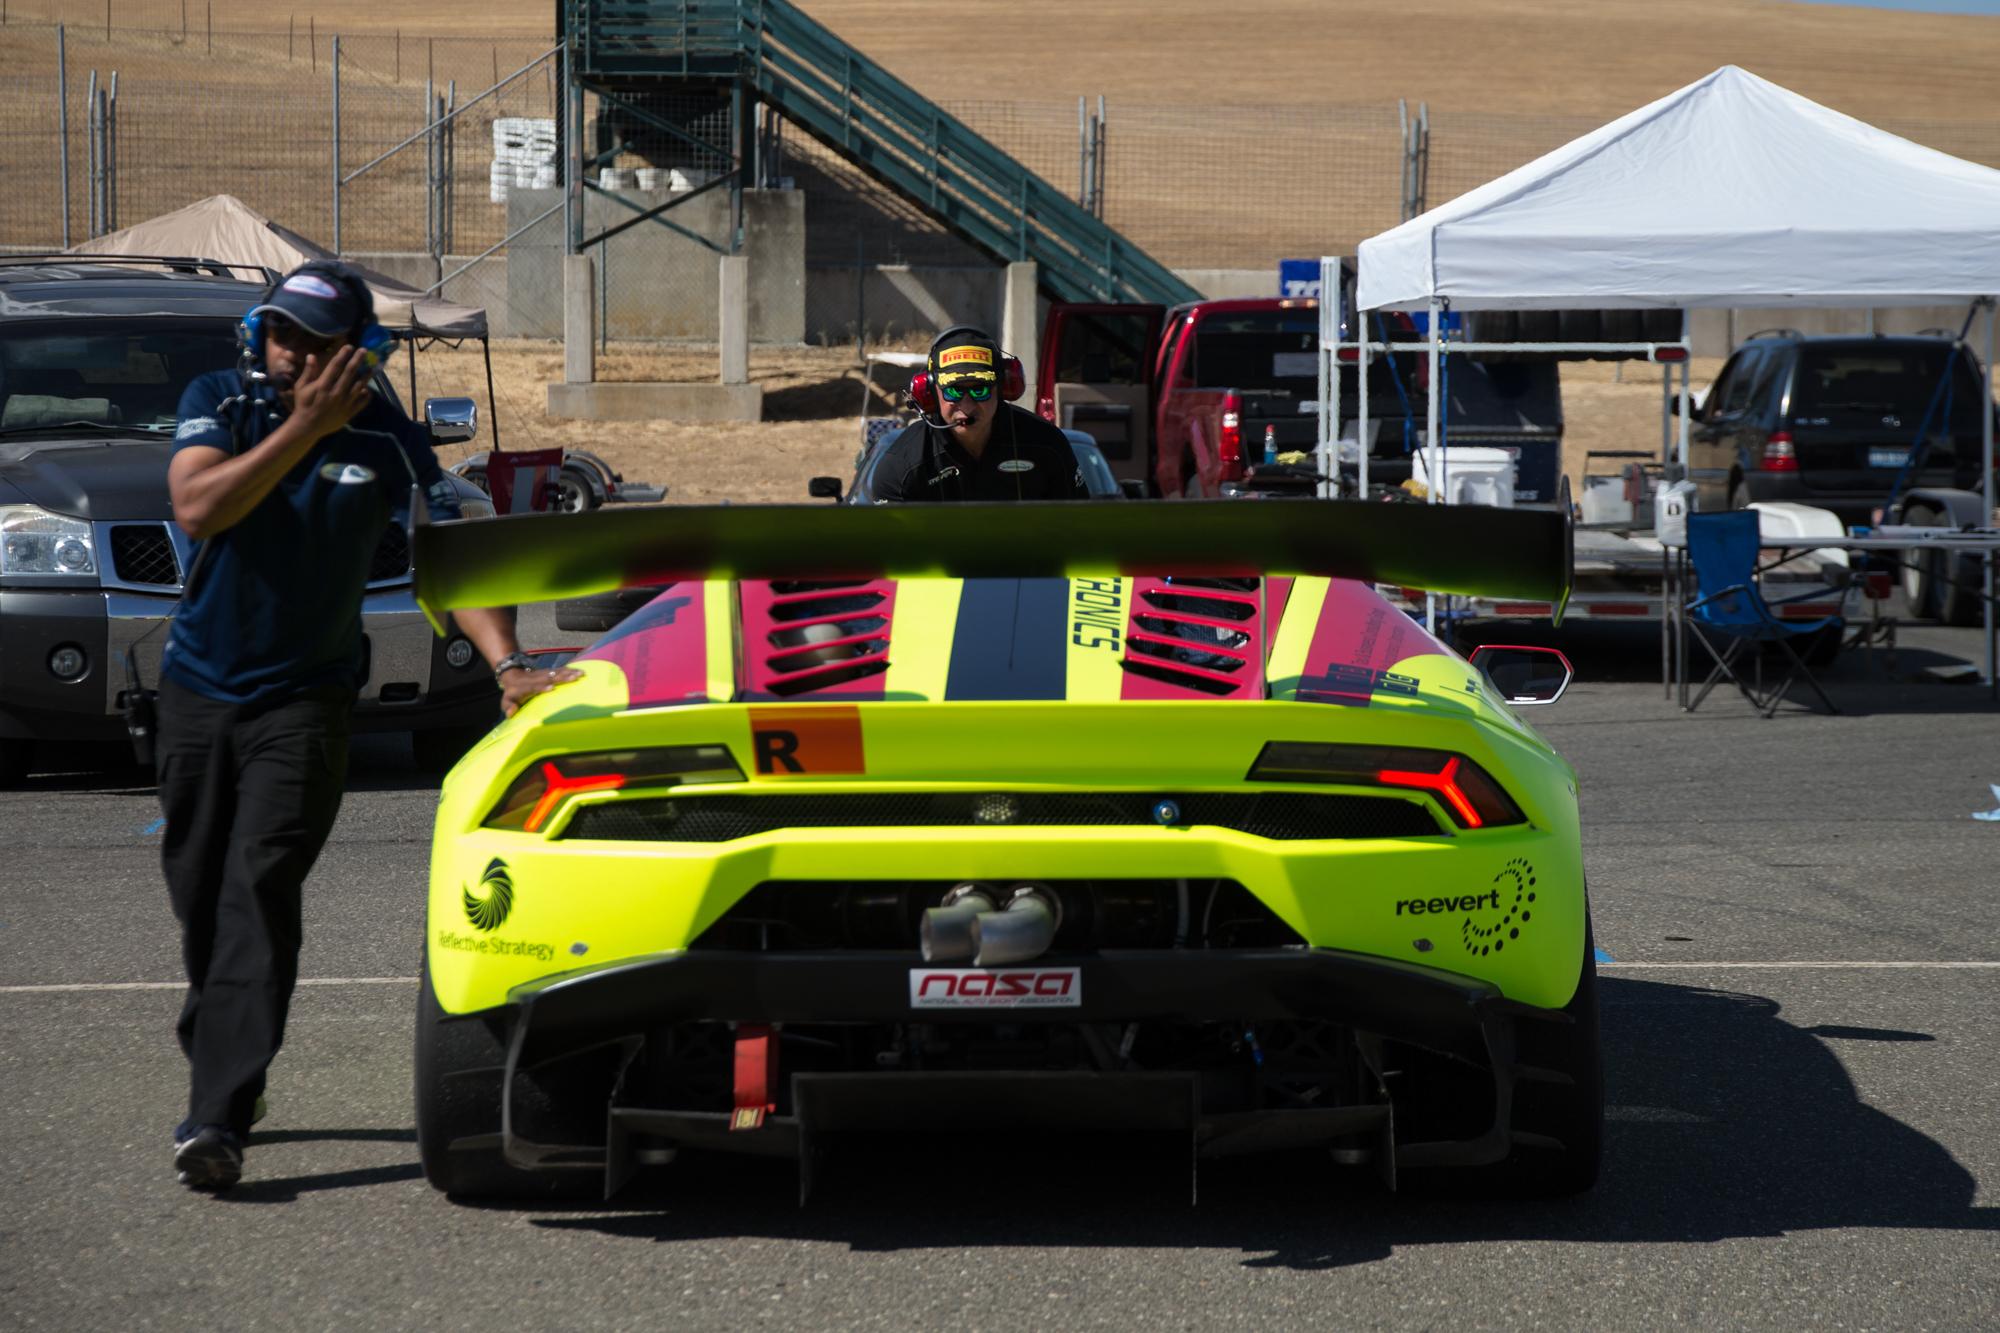 Steven-Racing-20171007-45354.jpg